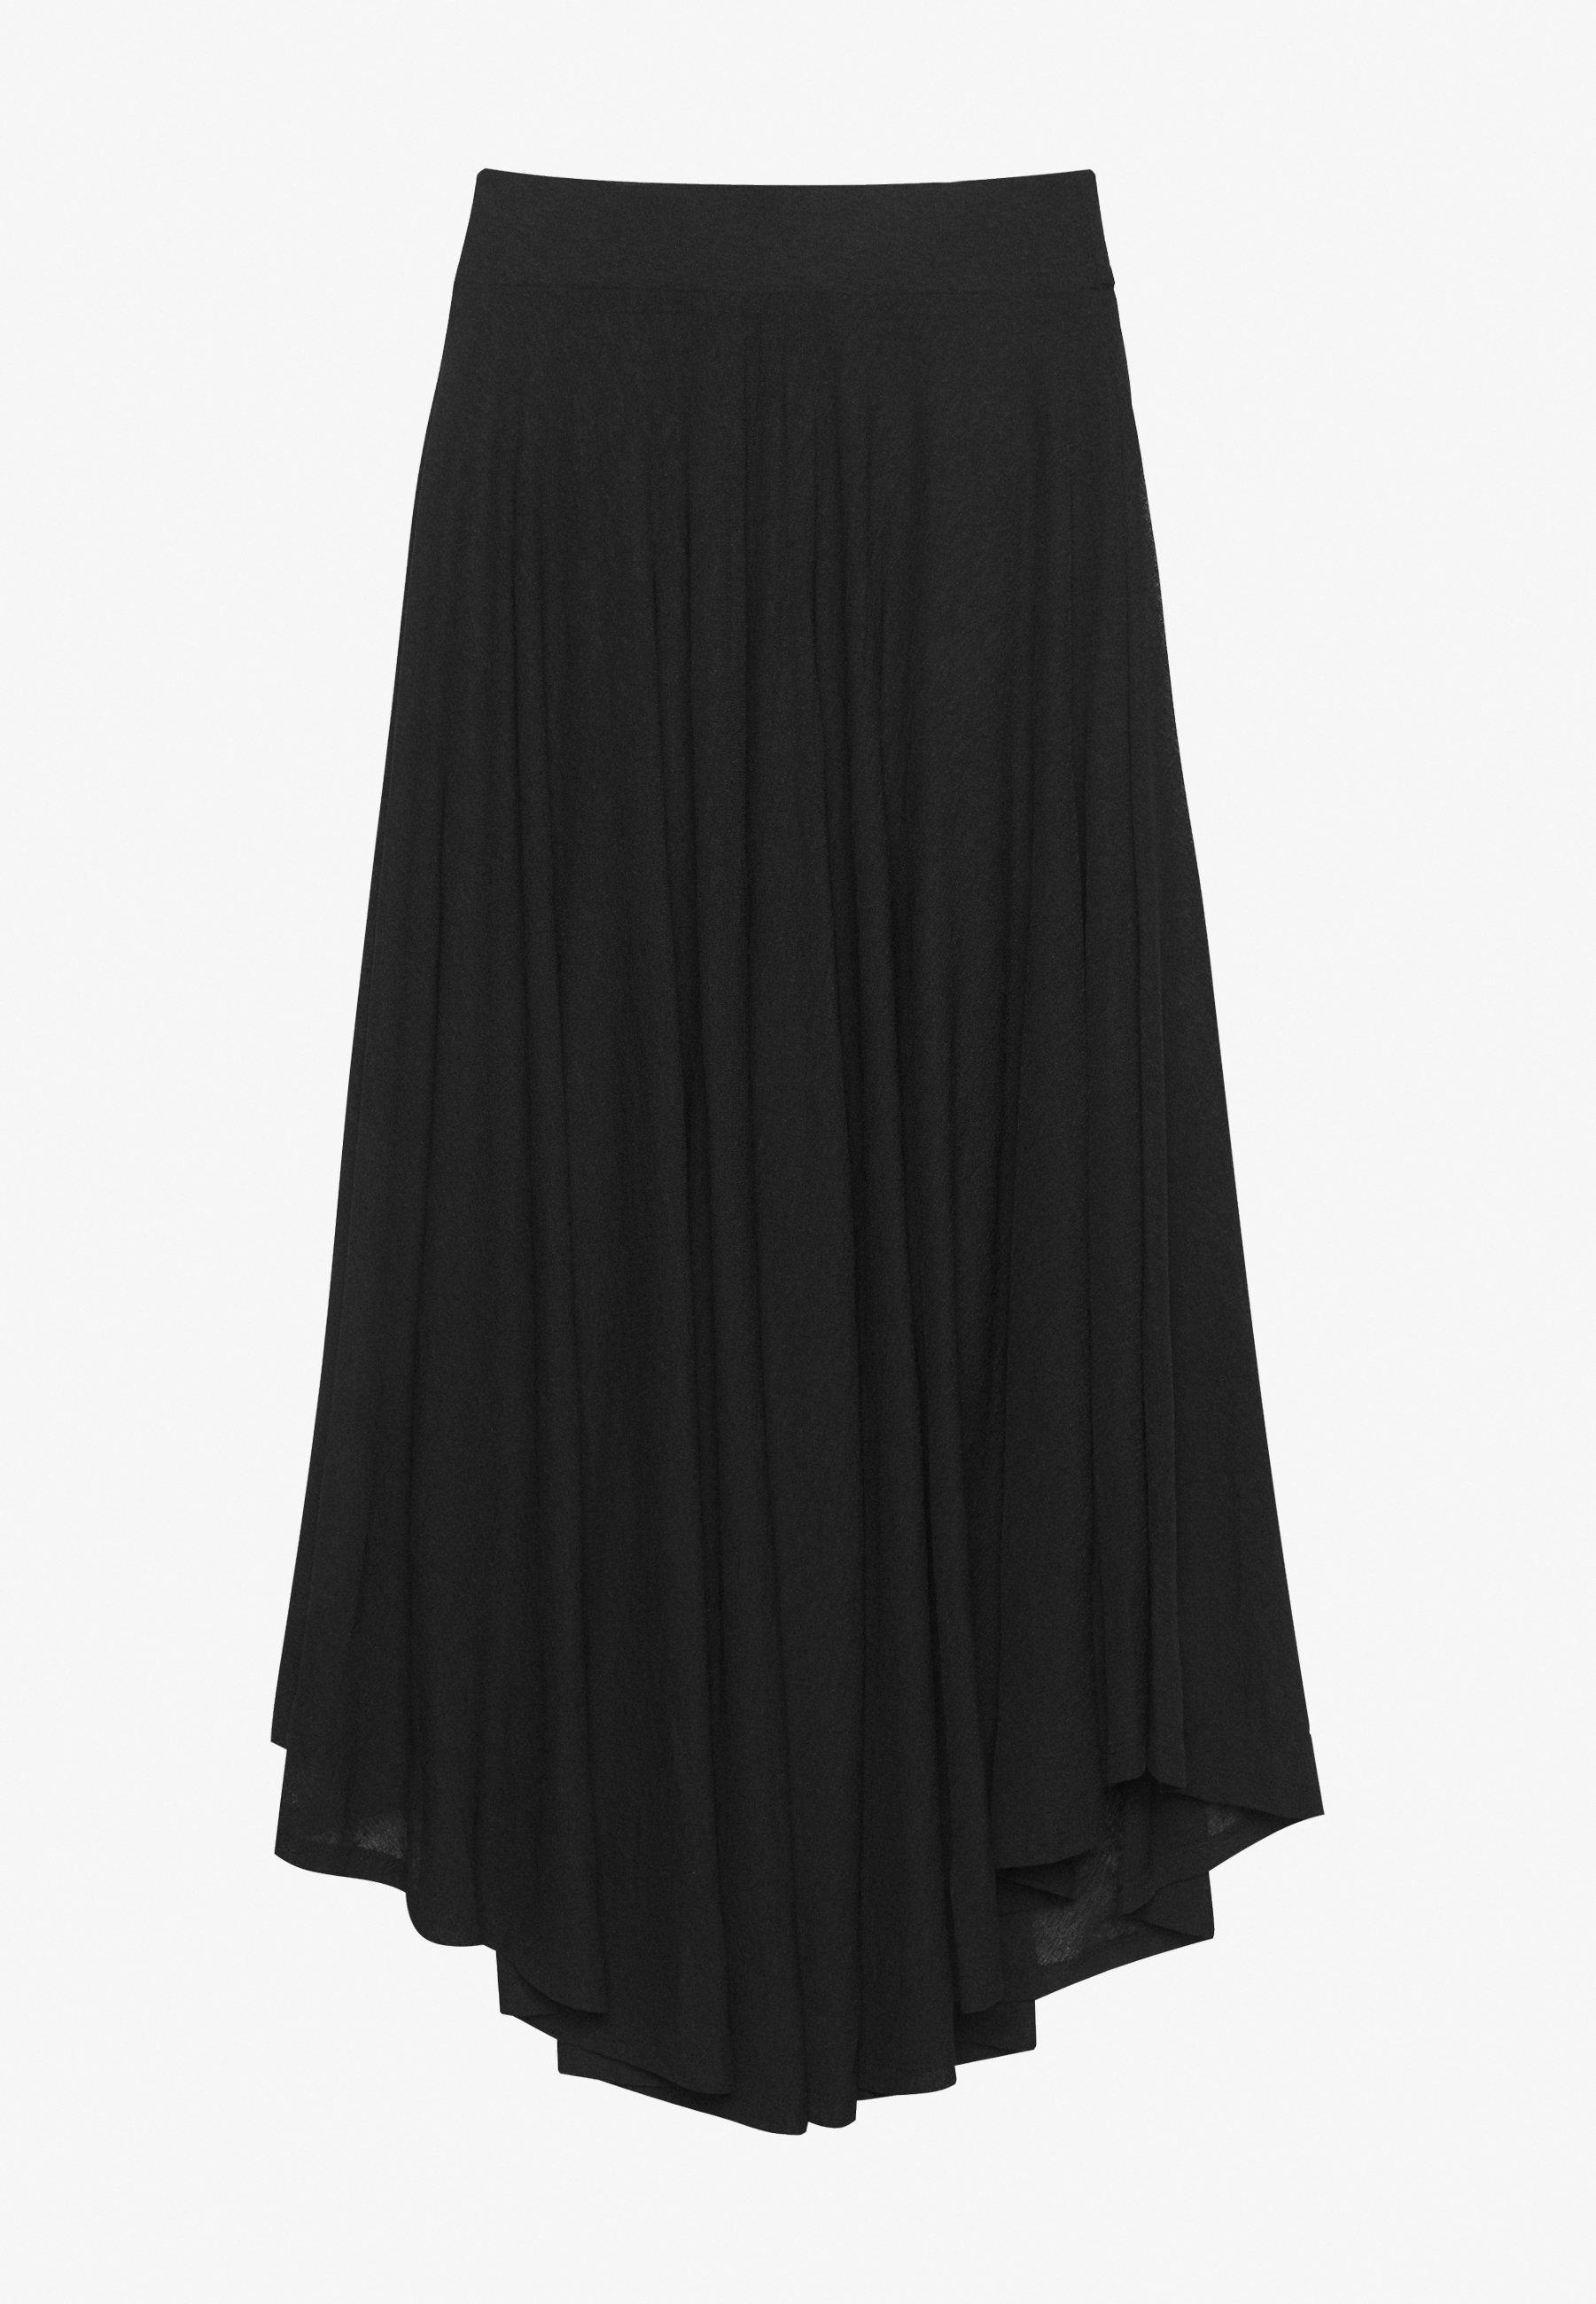 Esprit Skirt - A-linjekjol Black